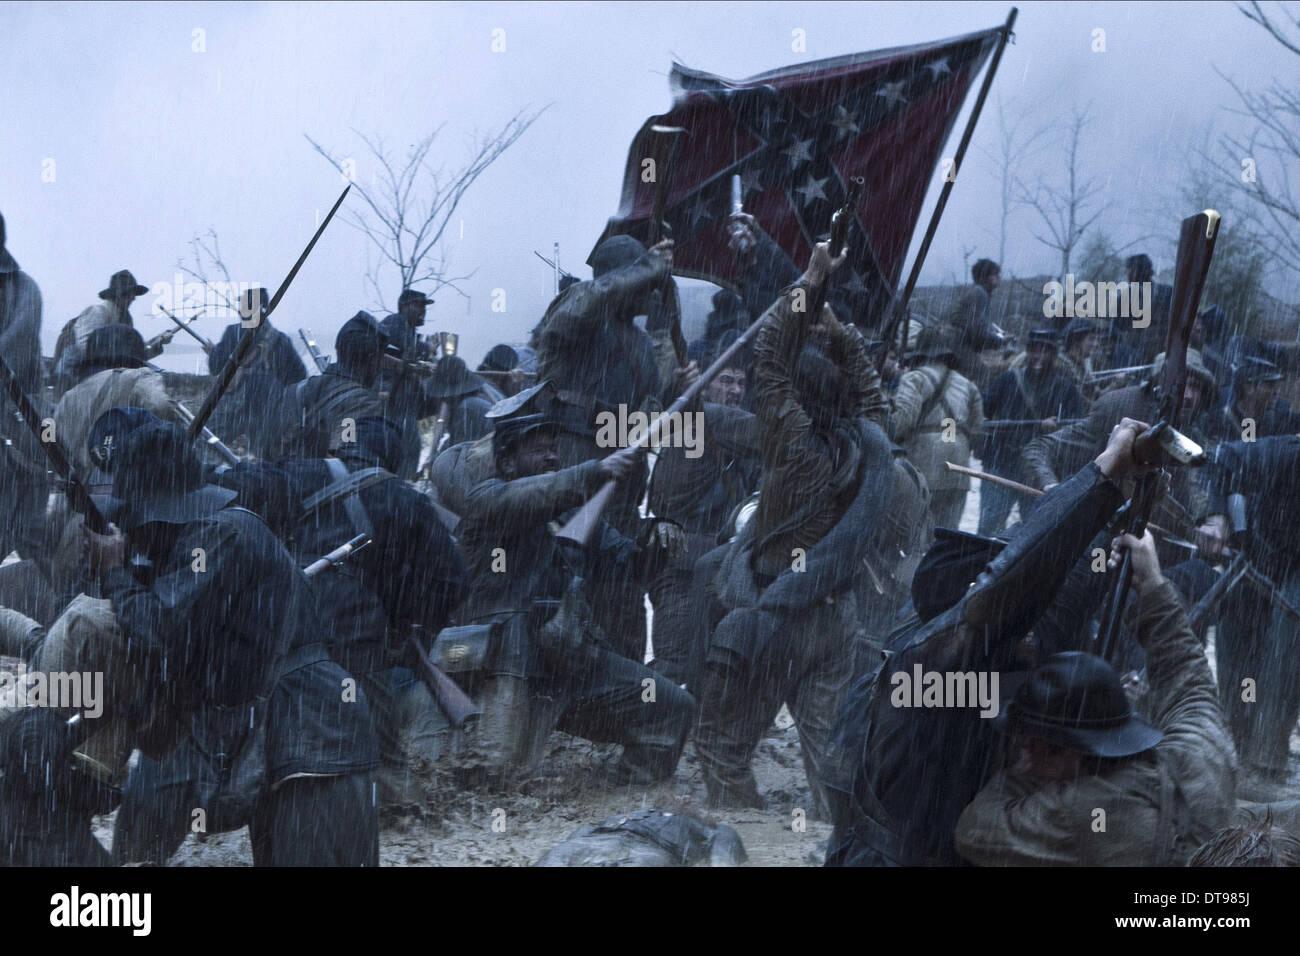 CIVIL WAR BATTLE SCENE LINCOLN (2012) - Stock Image